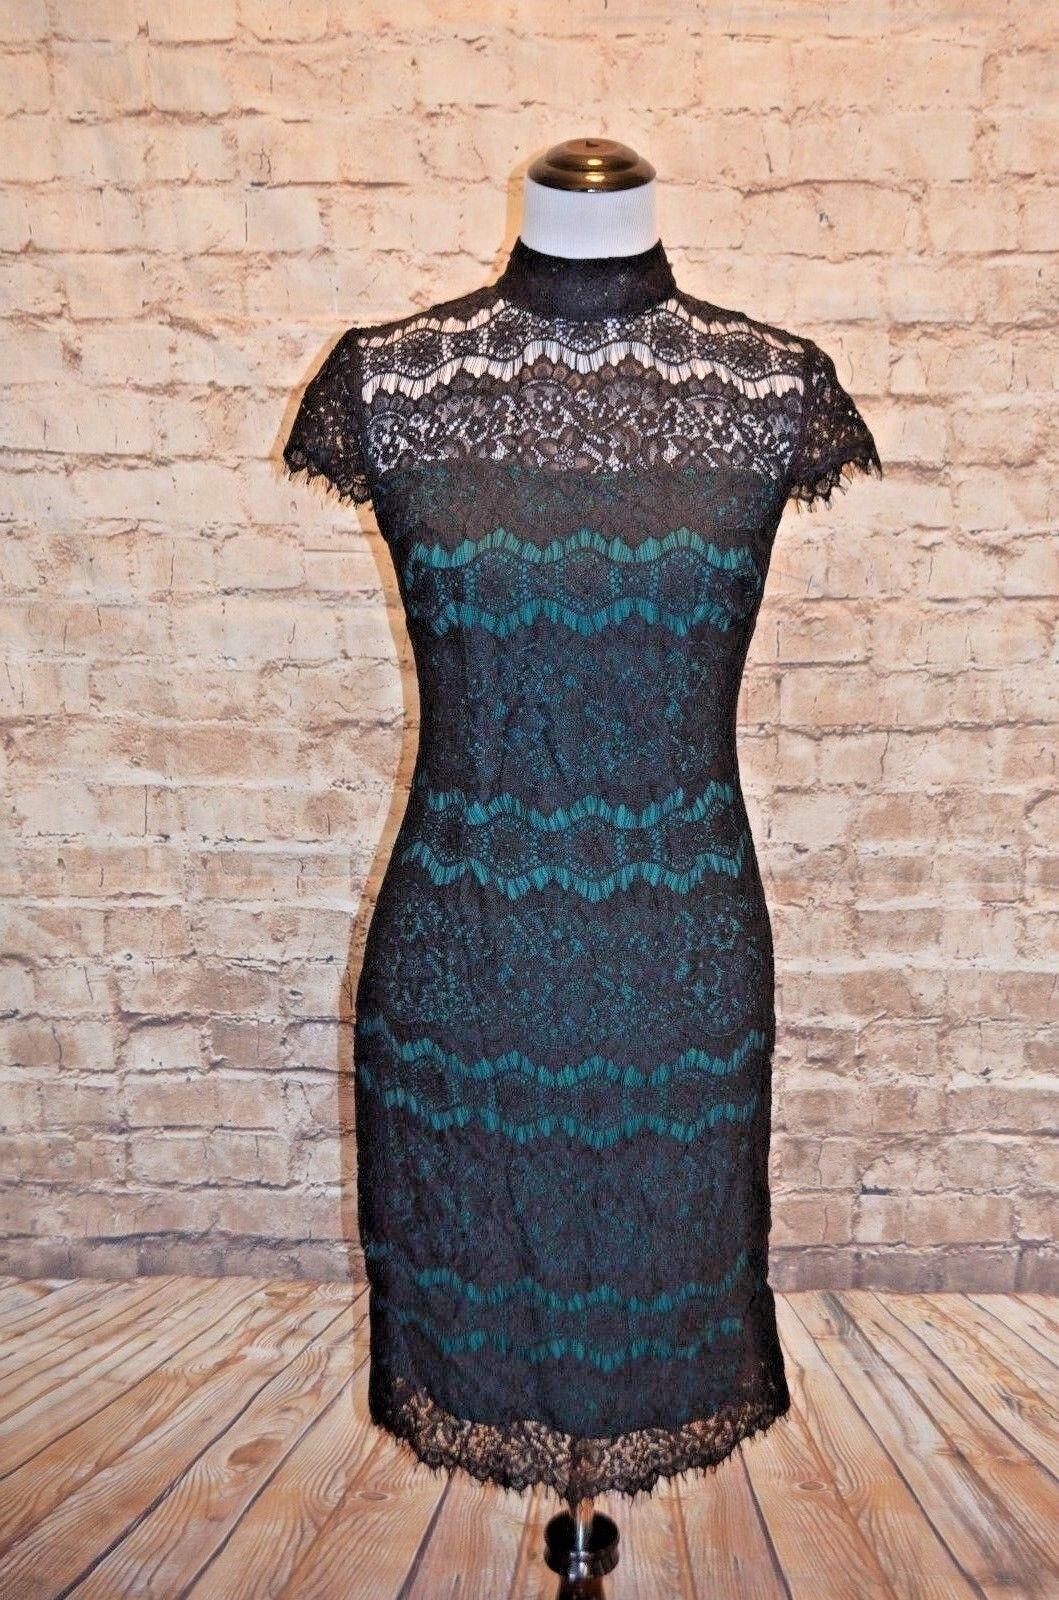 Modcloth Flattery at the Gallery Dress Lace NWT 4 Grün schwarz Sheath high neck